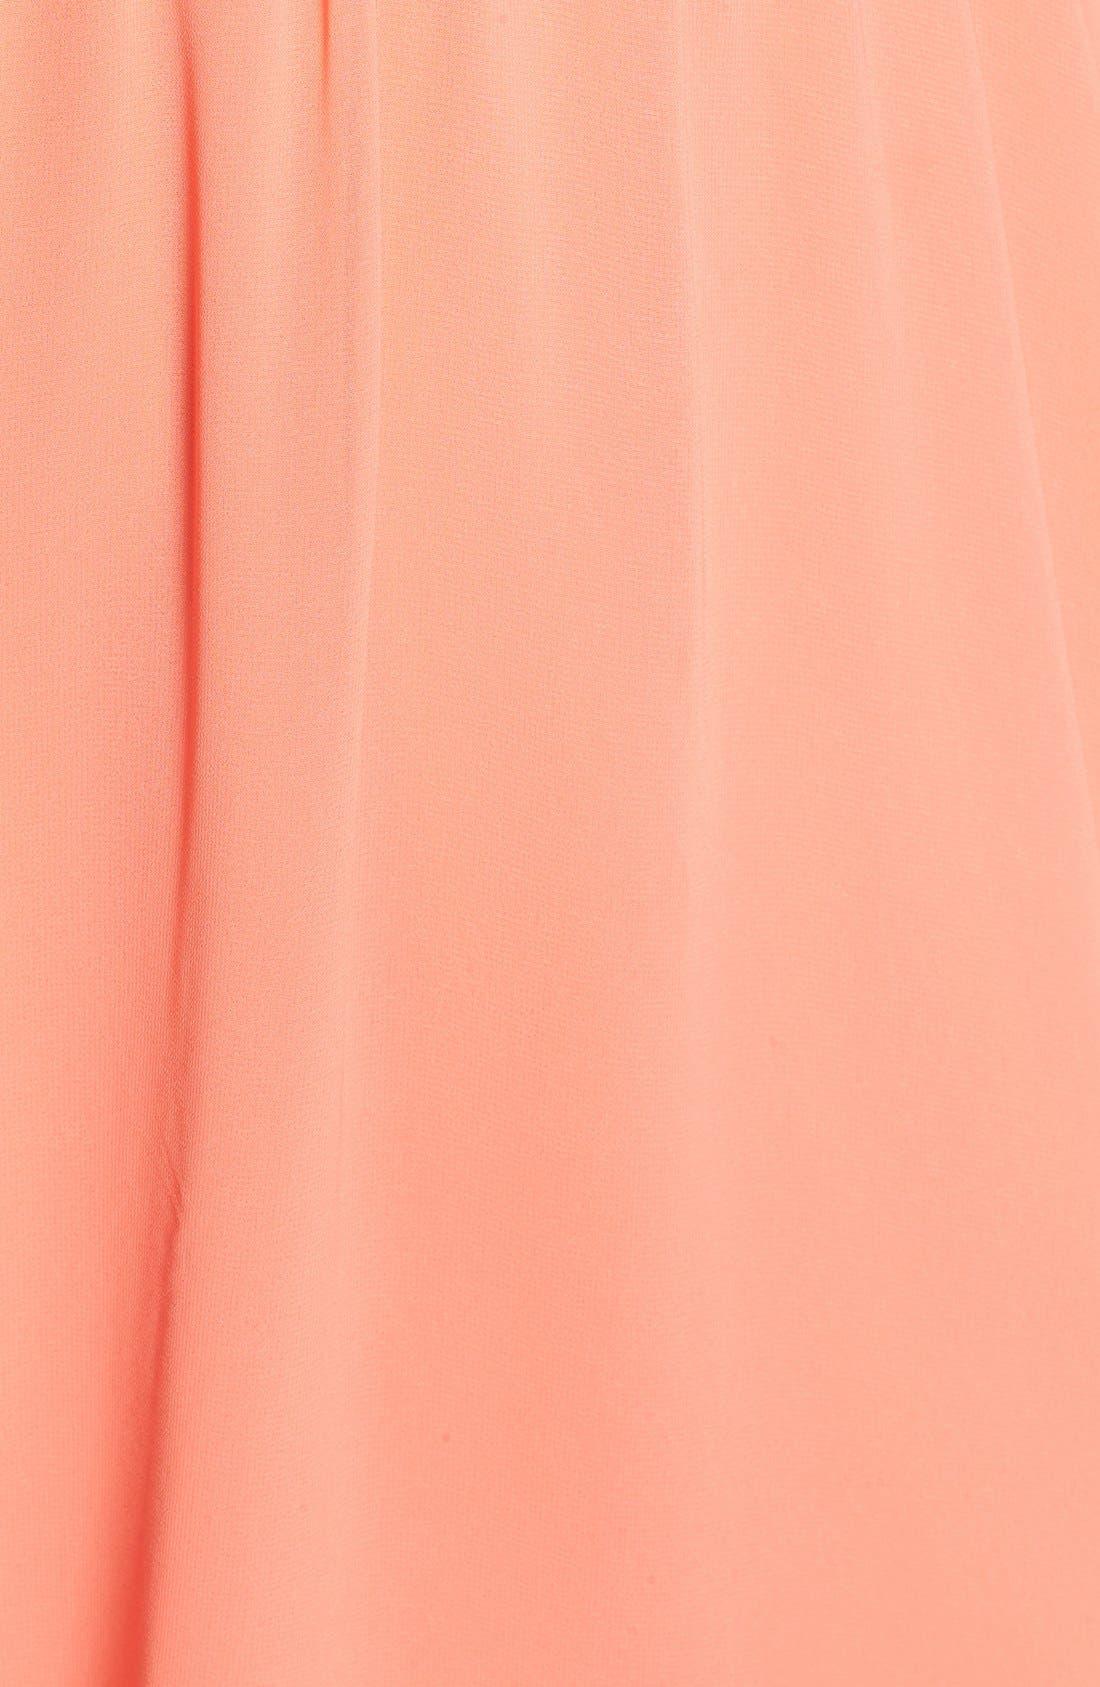 Blouson Chiffon Skater Dress,                             Alternate thumbnail 230, color,